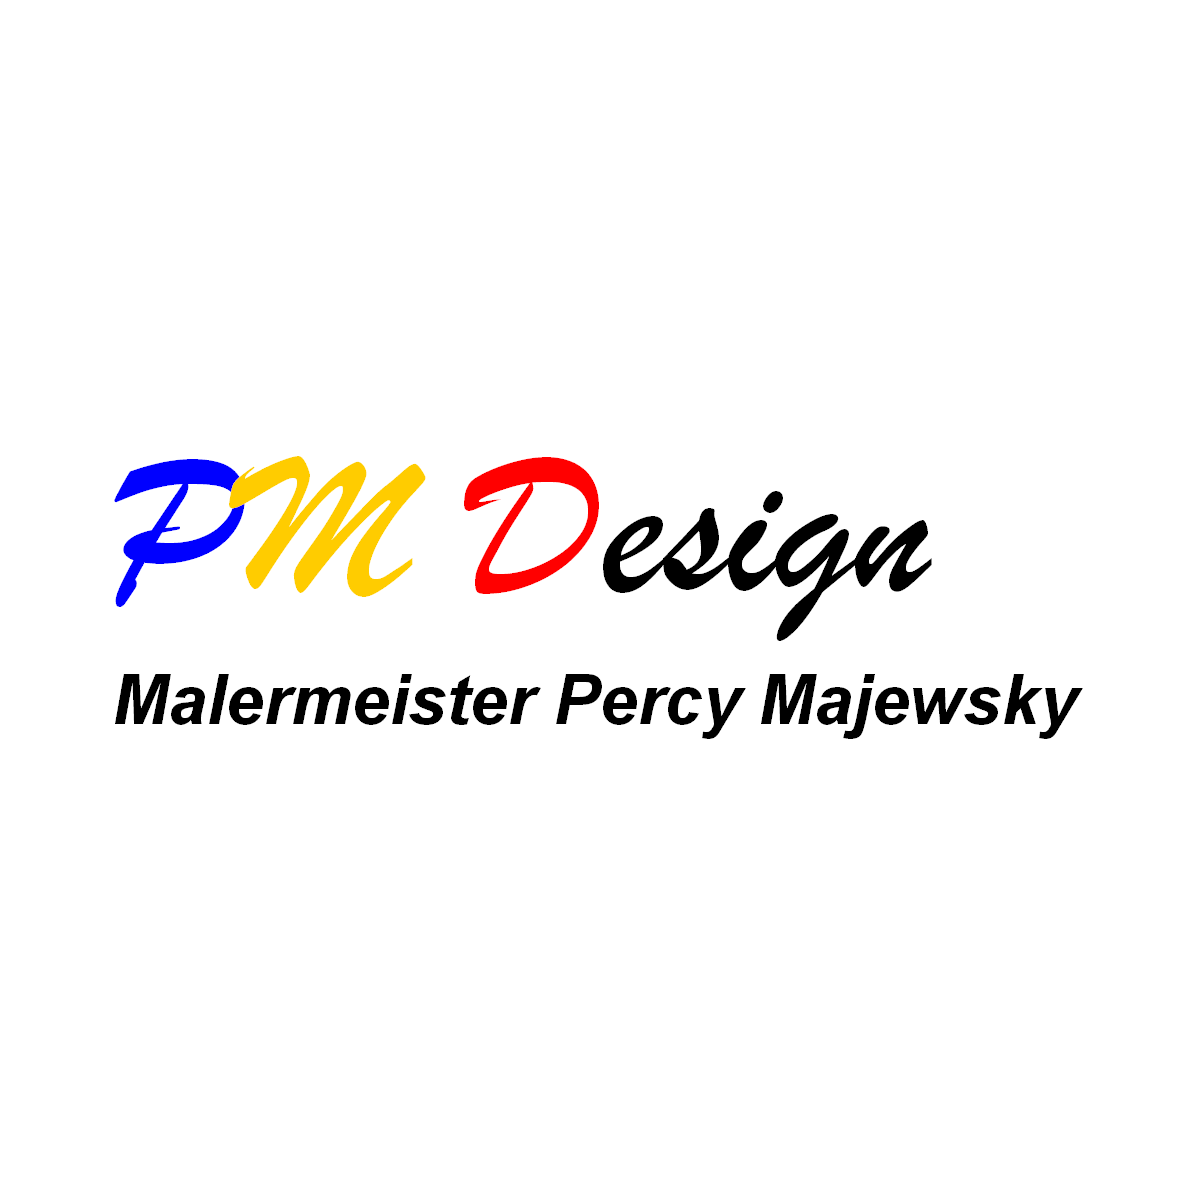 Bild zu PM Design - Malermeister Percy Majewsky in Mönchengladbach